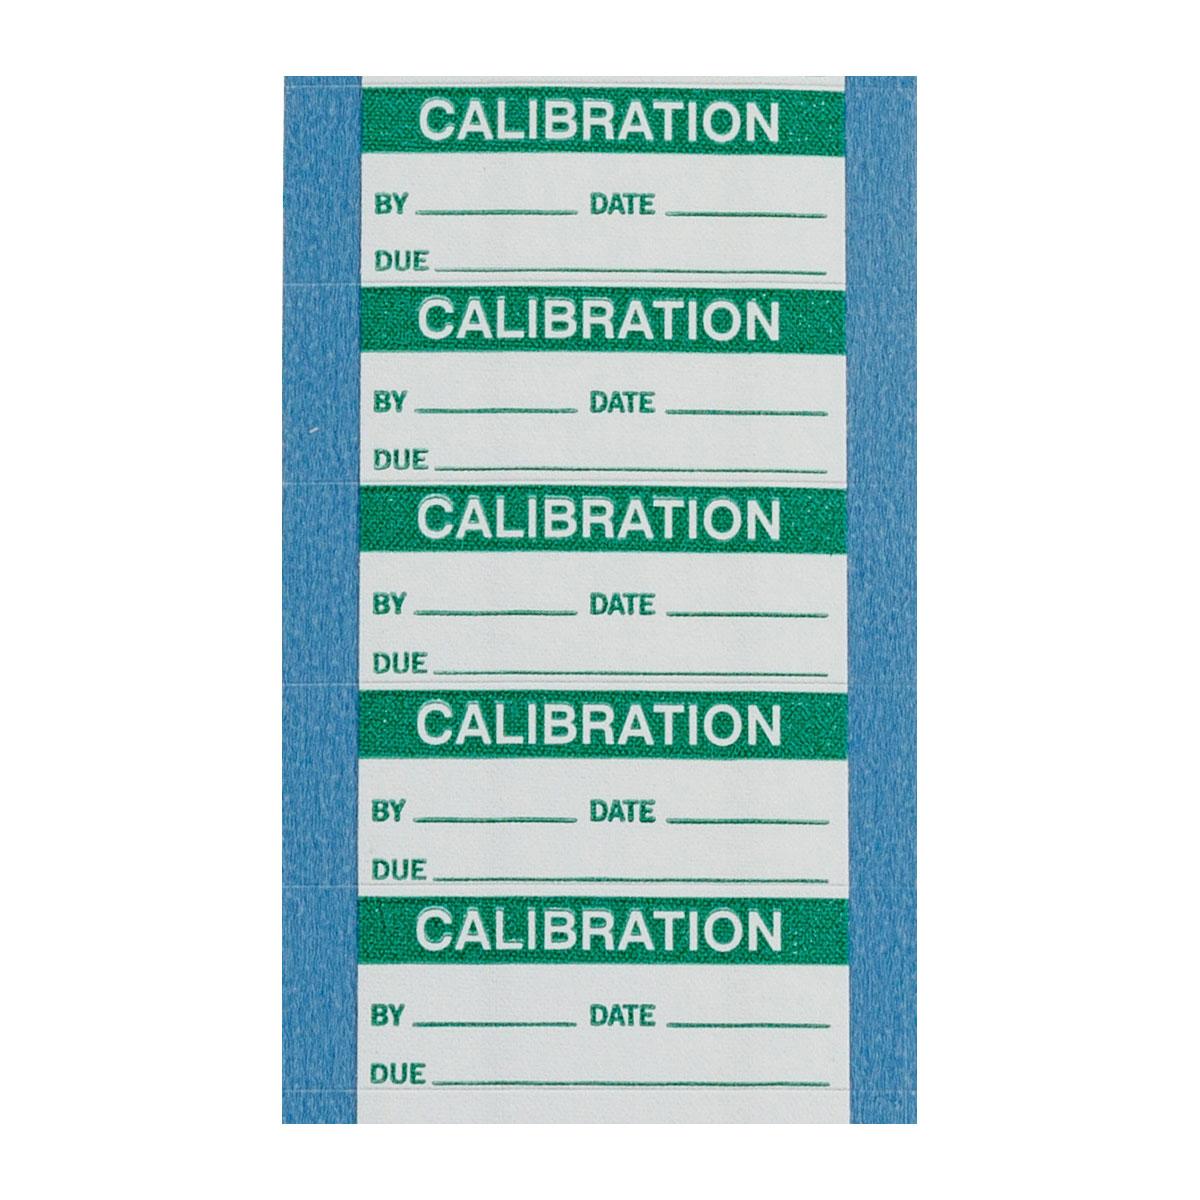 brady part wo 10 vp calibration labels. Black Bedroom Furniture Sets. Home Design Ideas